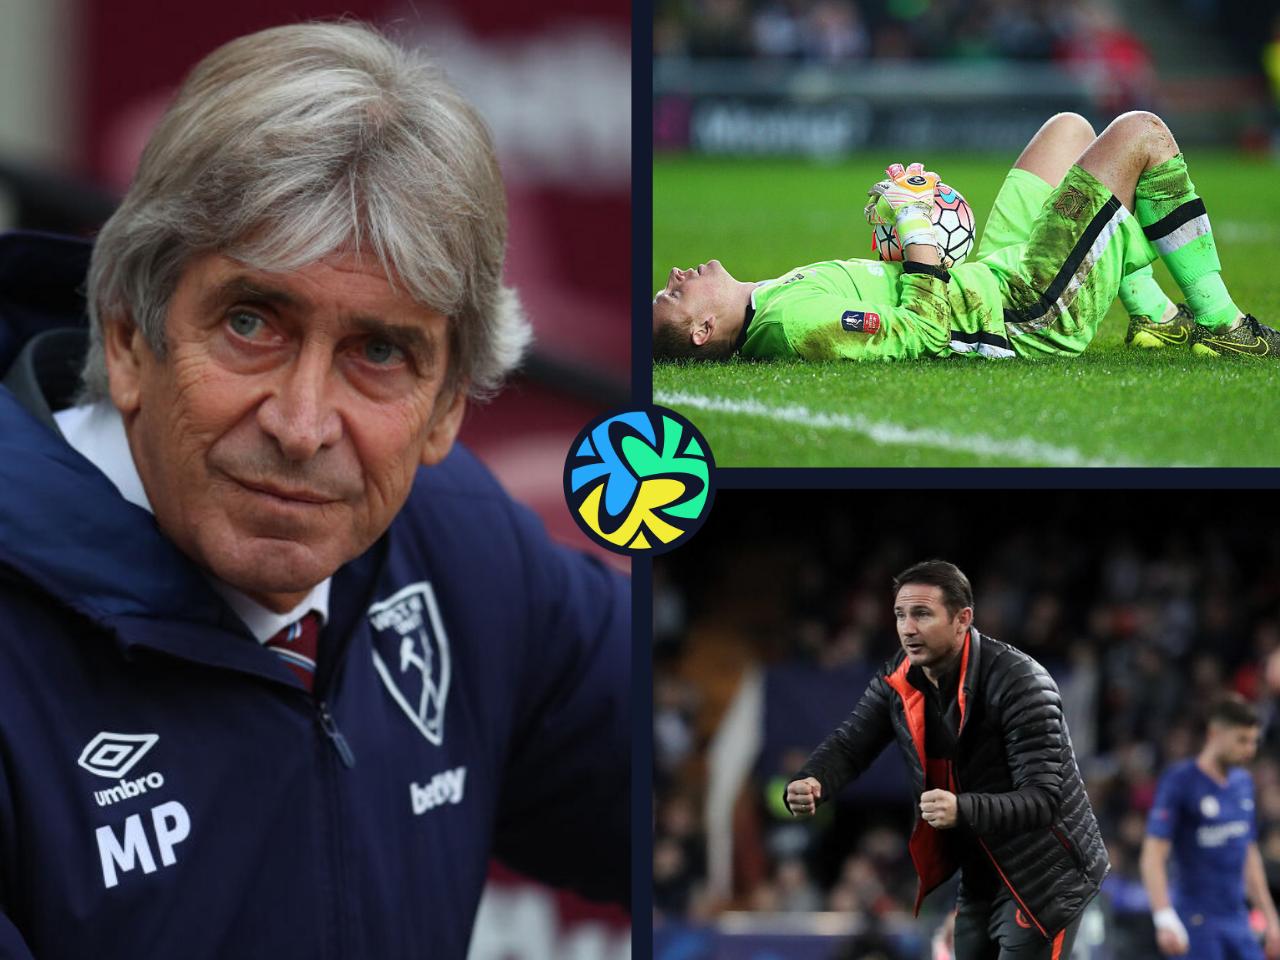 West Ham Chelsea David Martin Manuel Pellegrini Frank Lampard